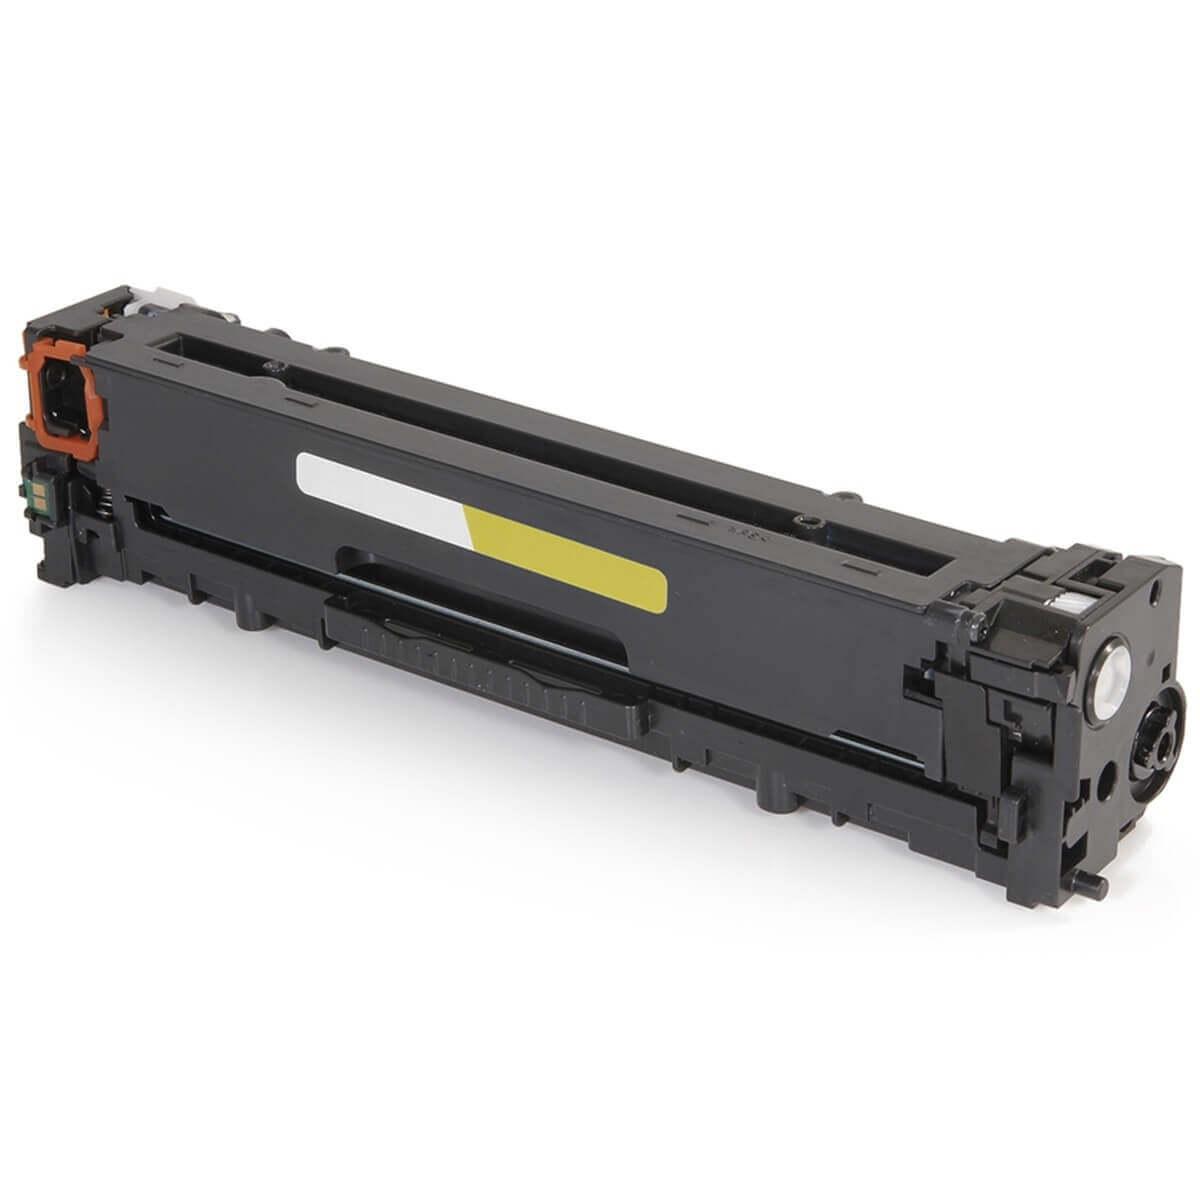 Toner Lotus para impressoras Hp Cb542a Ce322a Cf212 Yellow